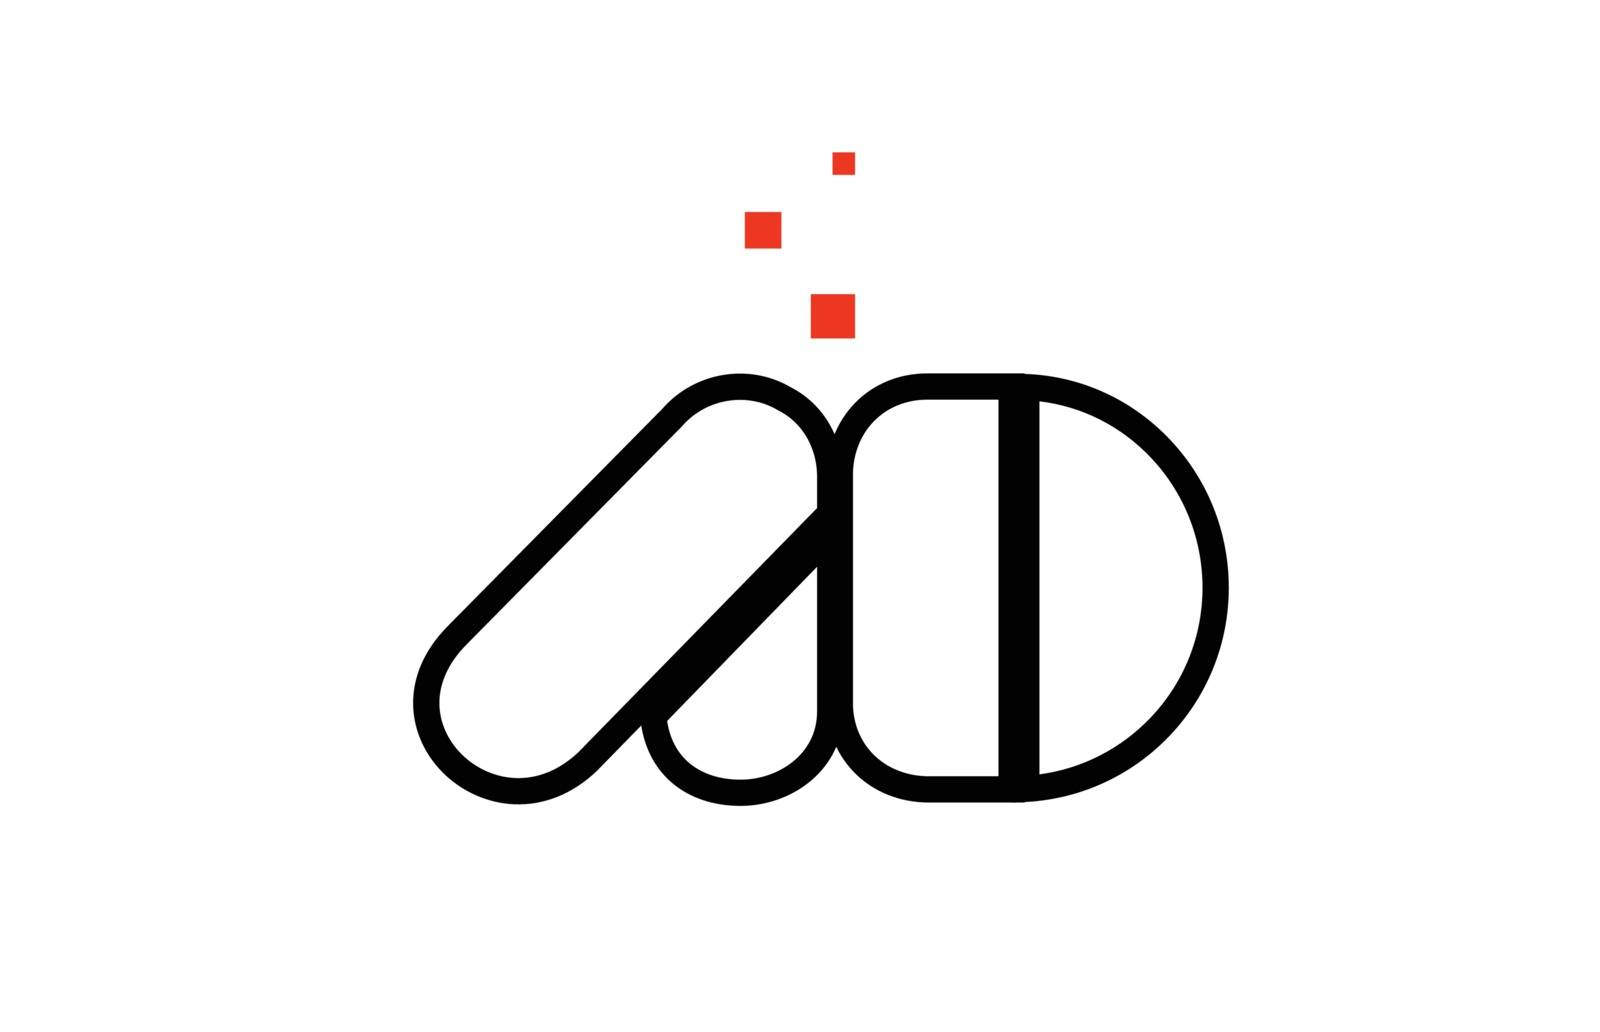 AD A D black white red alphabet letter combination logo icon des by dragomirescu